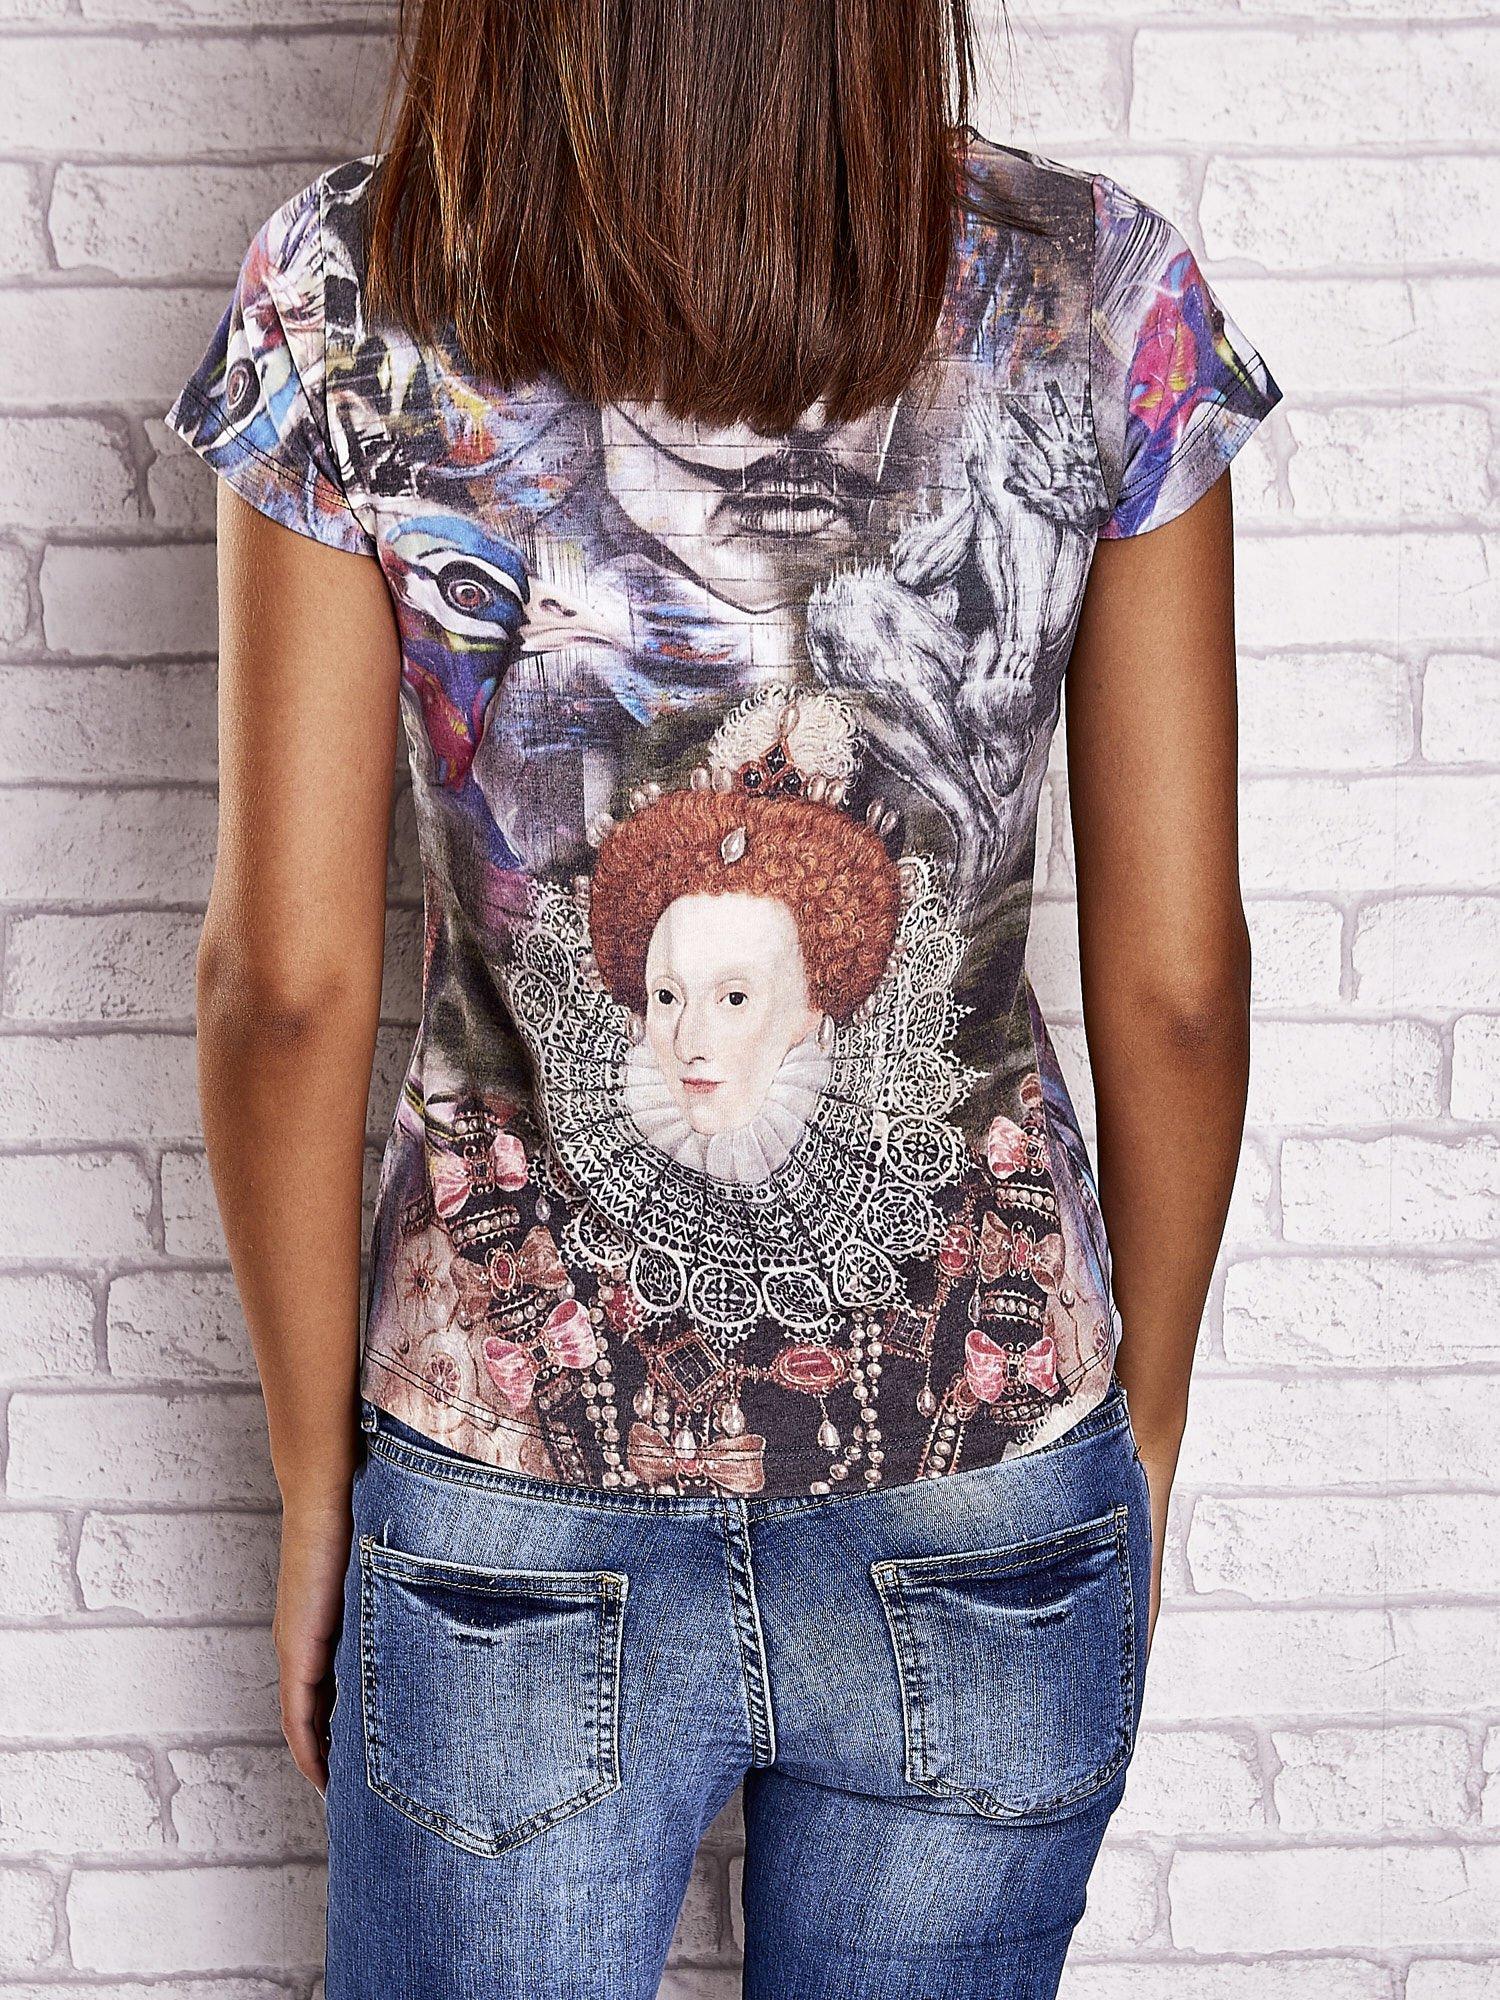 Szary t-shirt z nadrukiem graffiti i królowej                                  zdj.                                  2